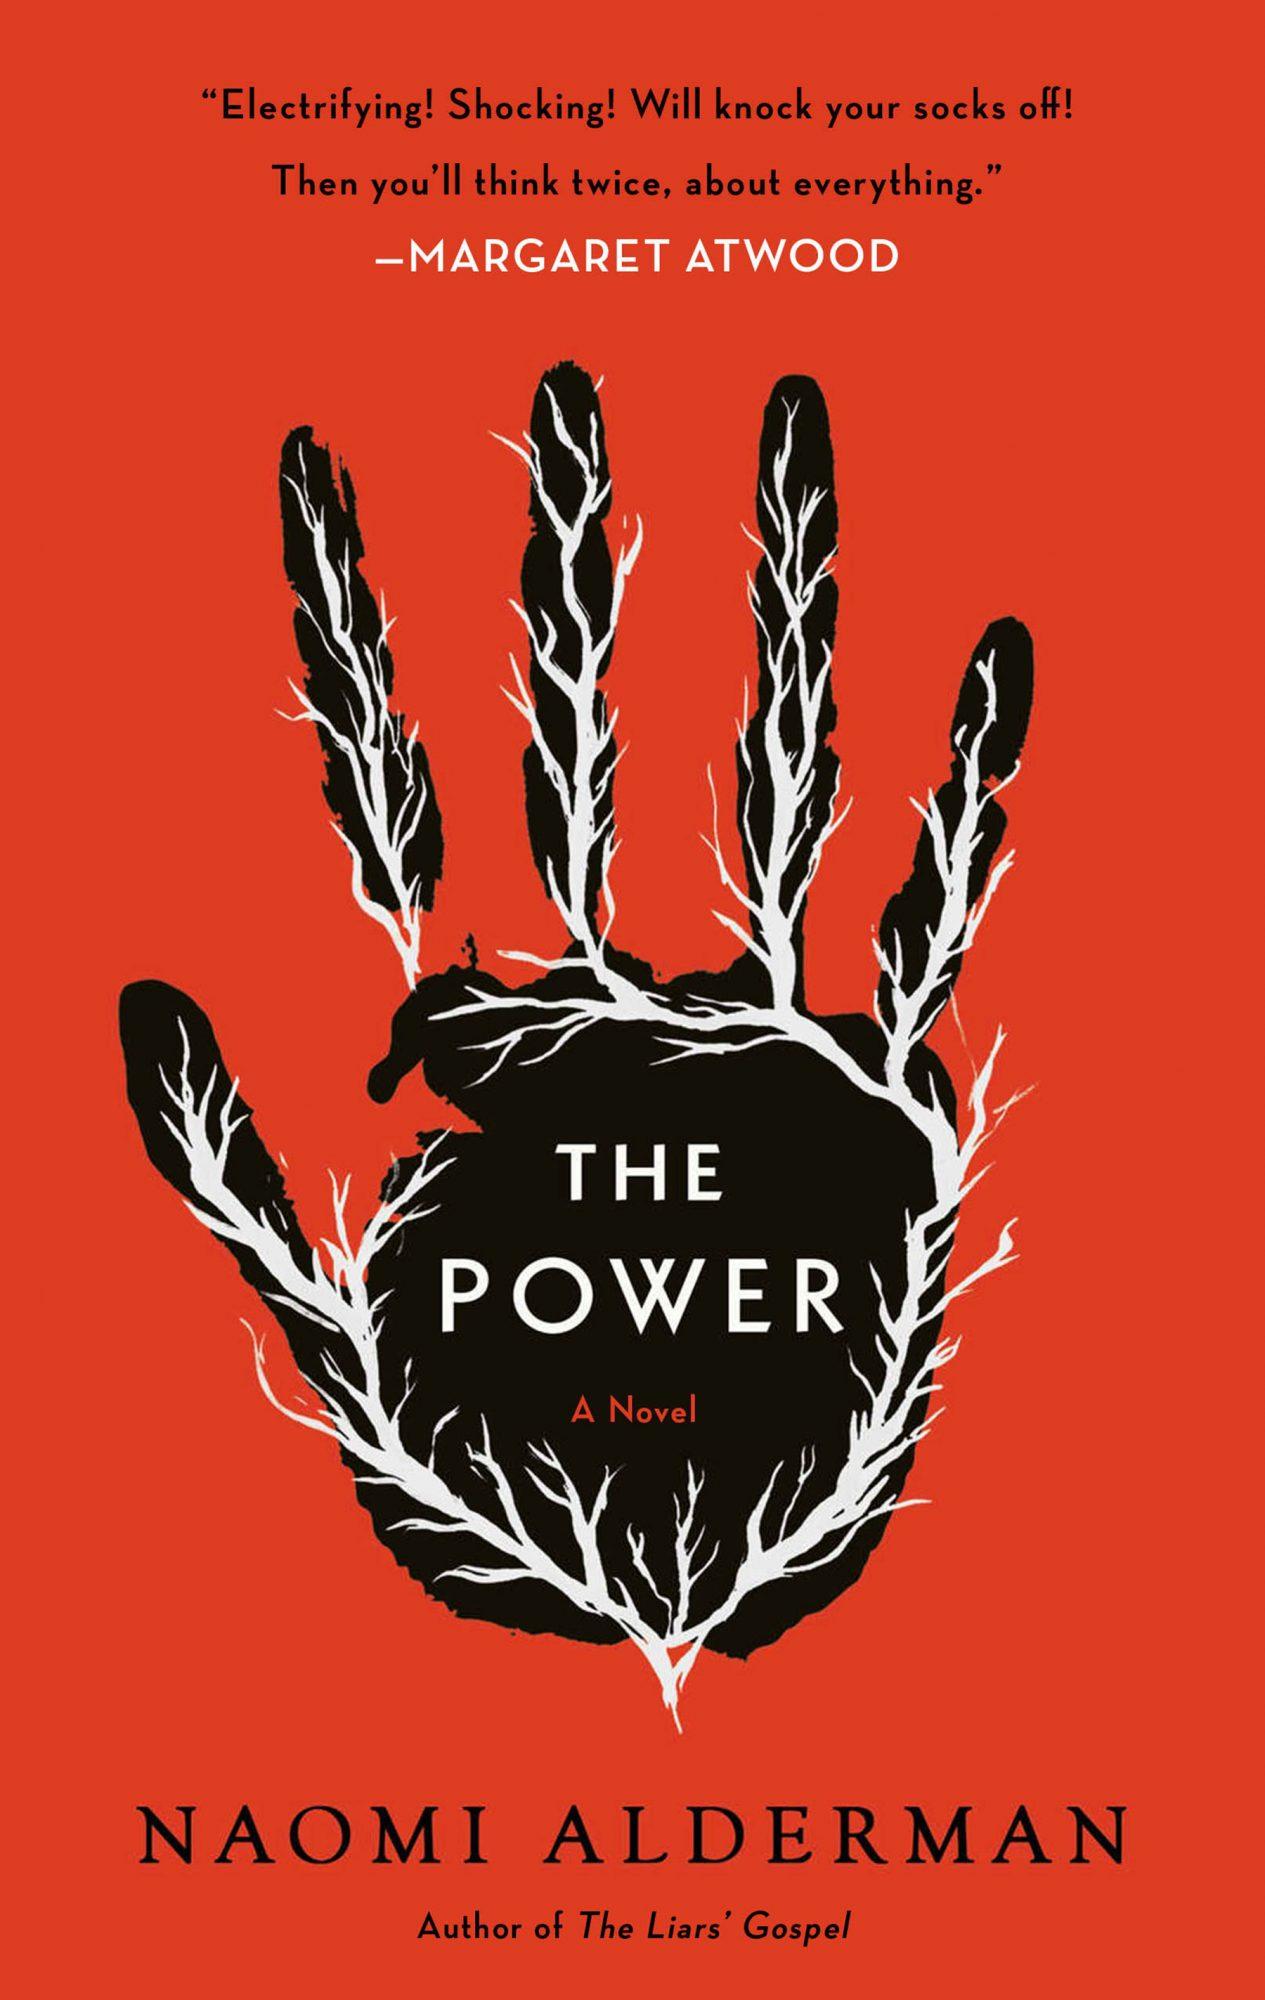 The Powerby Naomi Alderman